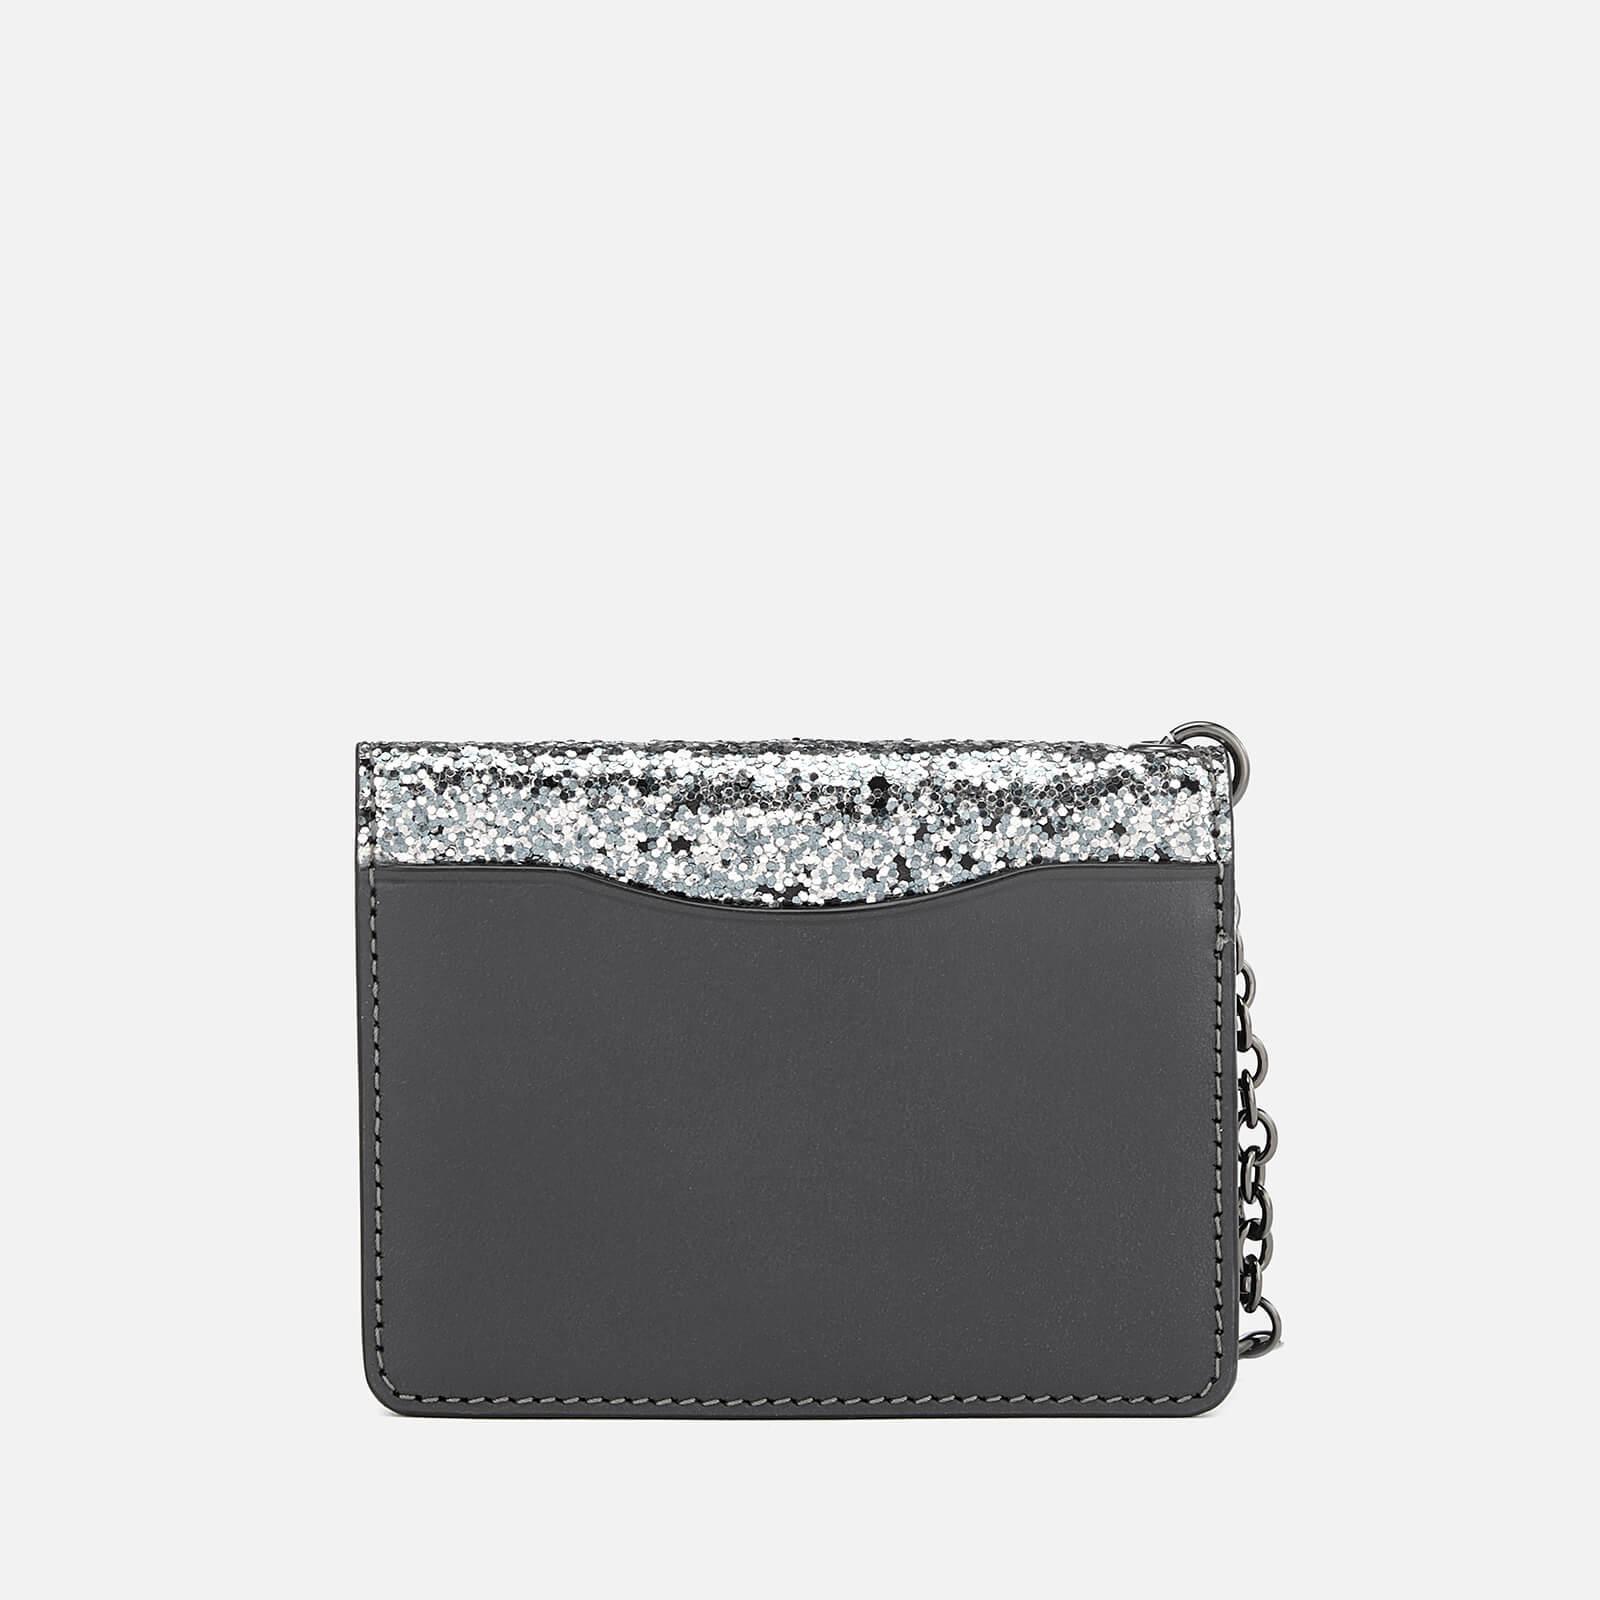 18c0576f32 COACH Glitter Key Ring Card Case in Metallic - Lyst